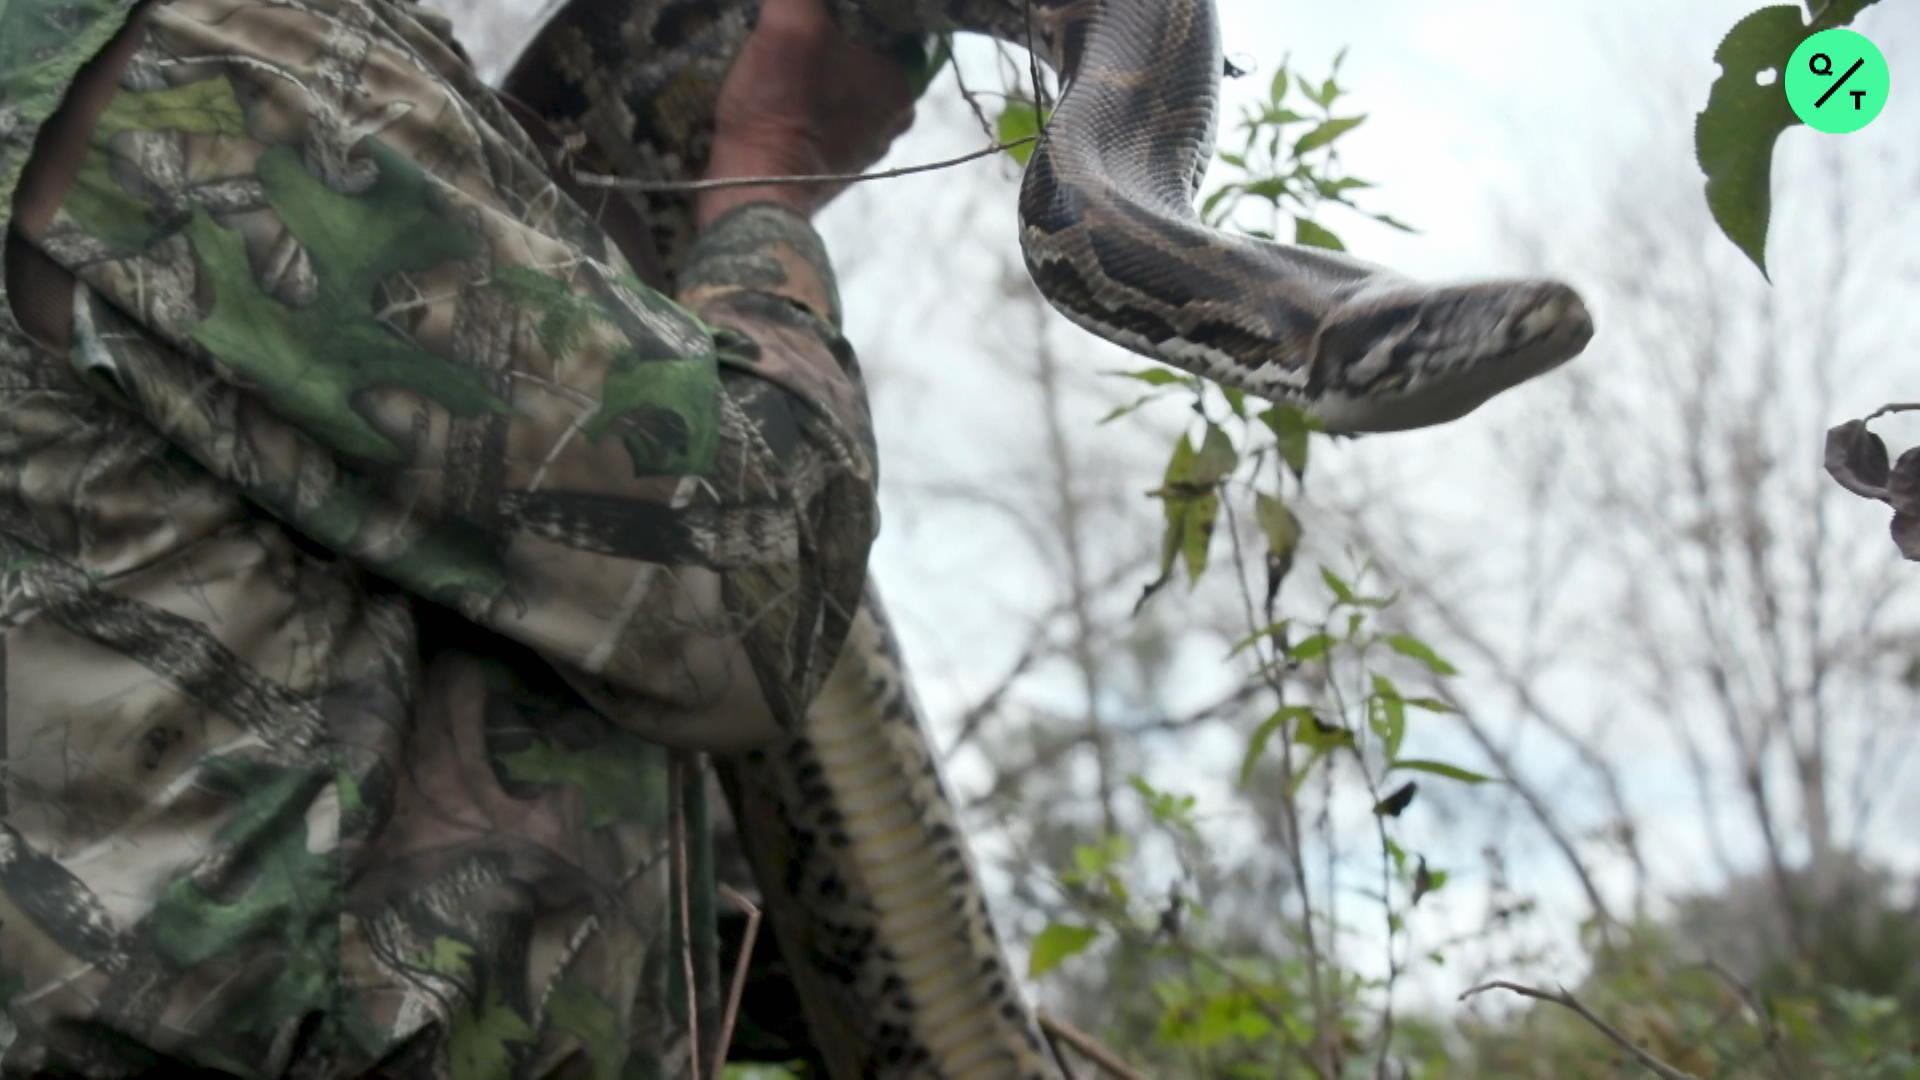 Python Hunters Are Saving The Everglades